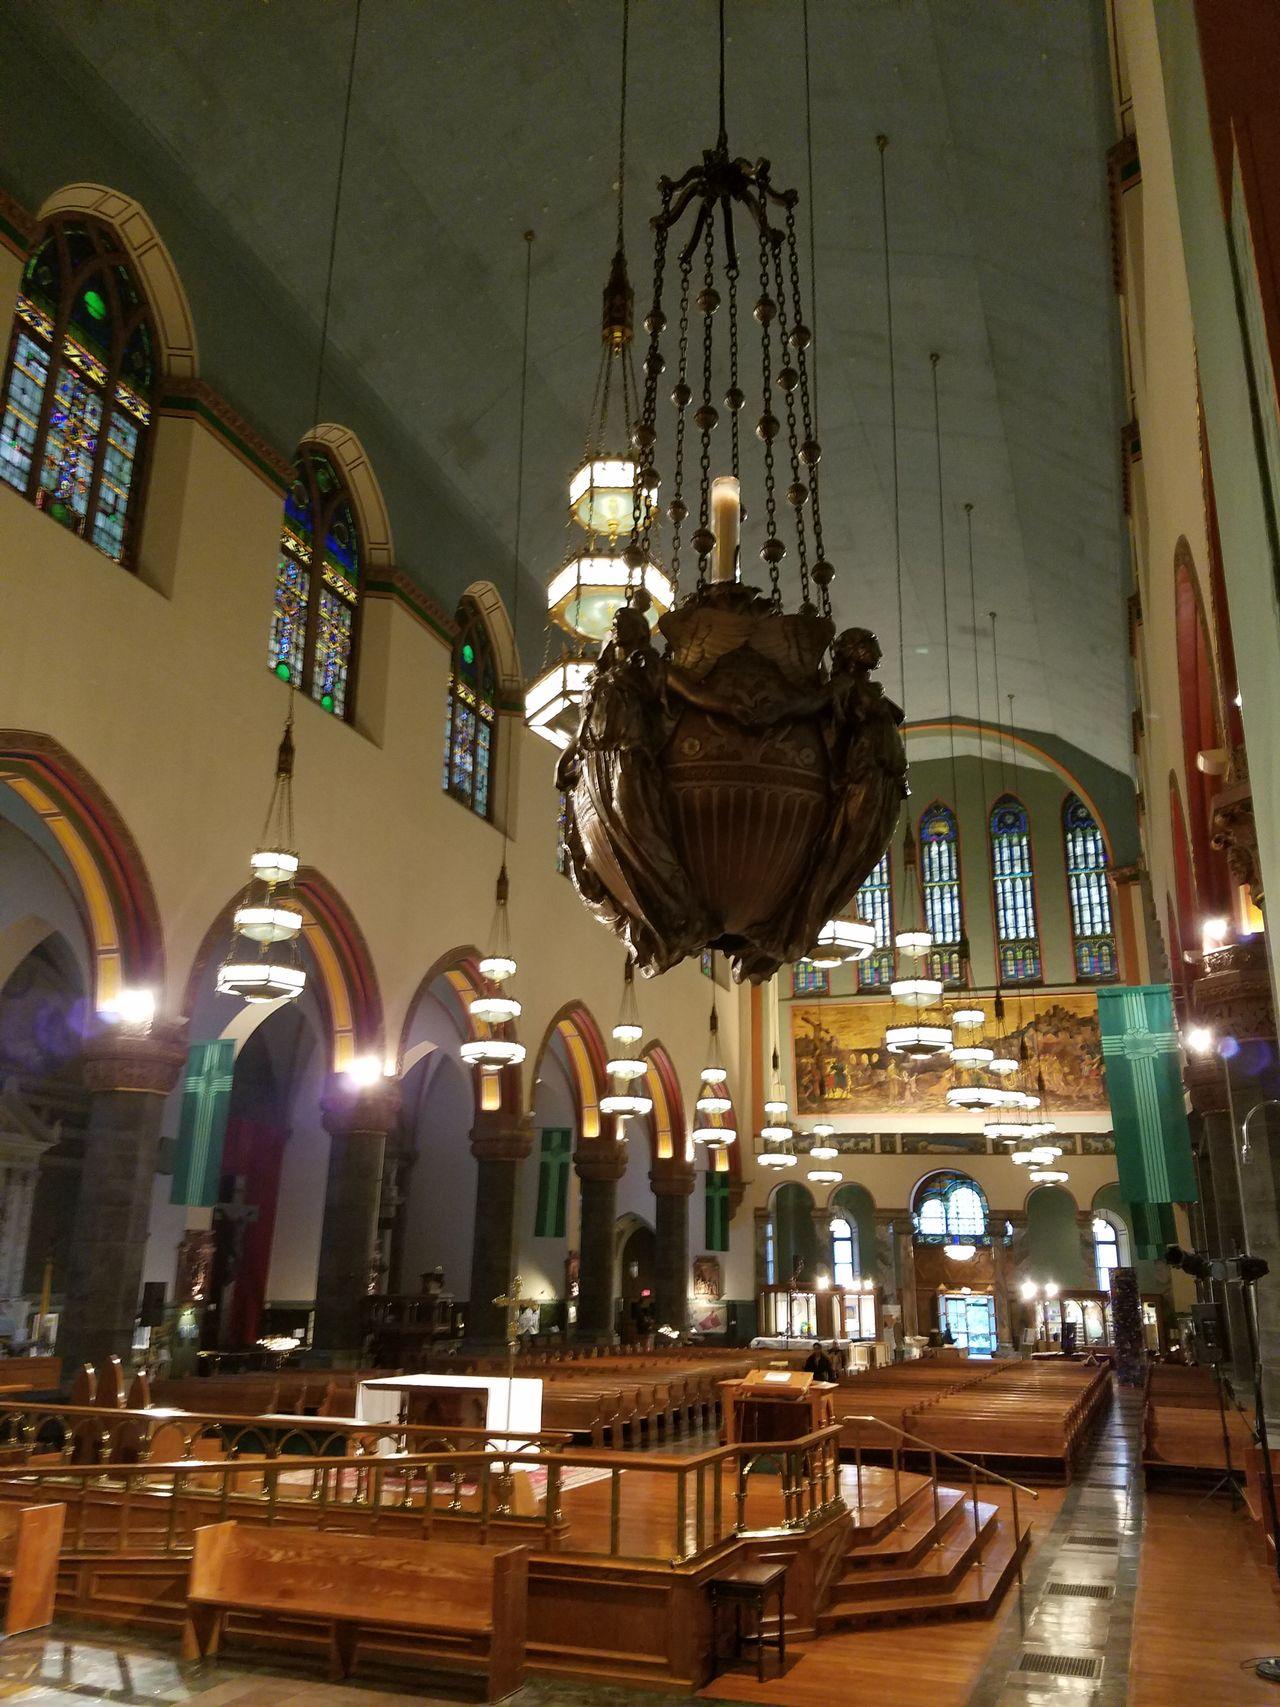 Church Beauty Inmensidad Indoors  Illuminated No People Vessel